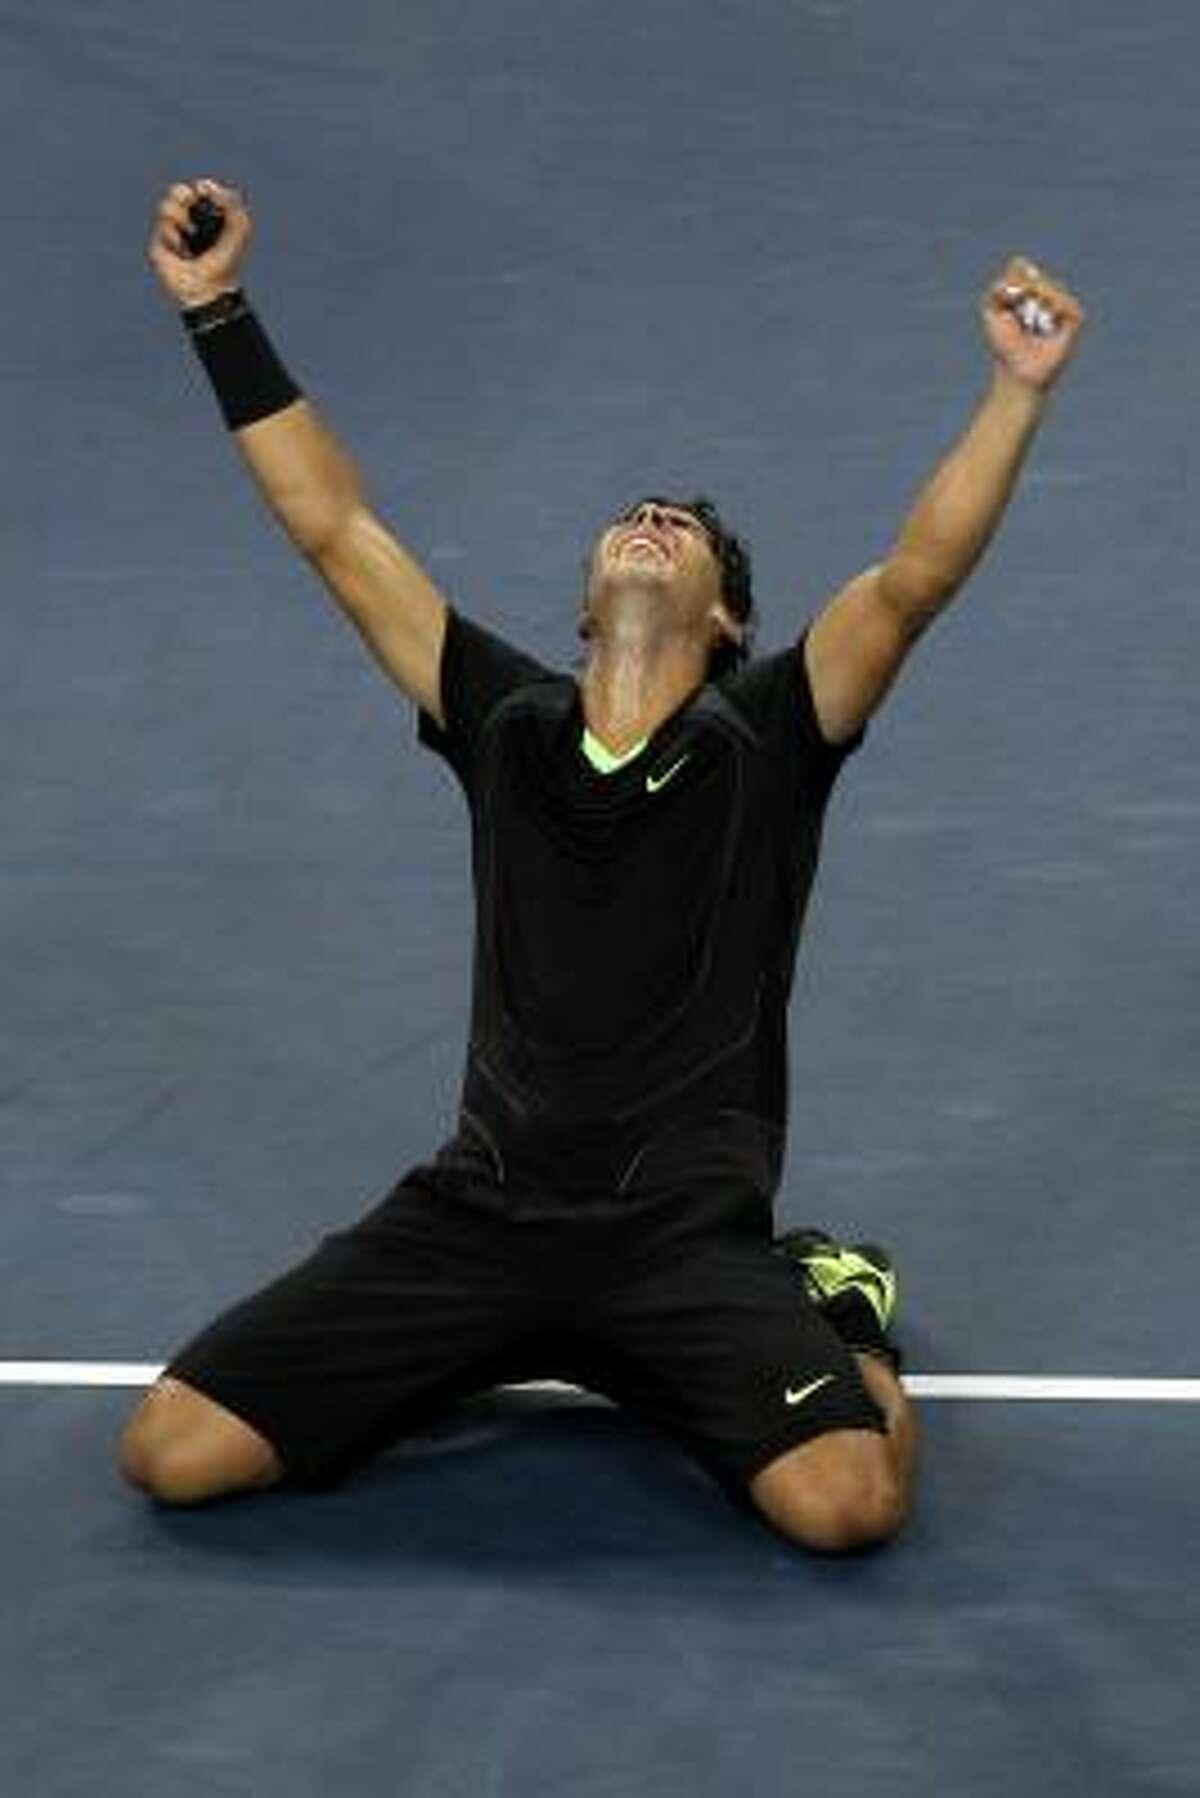 Rafael Nadal falls to his knees in celebration of his win over Novak Djokovic.